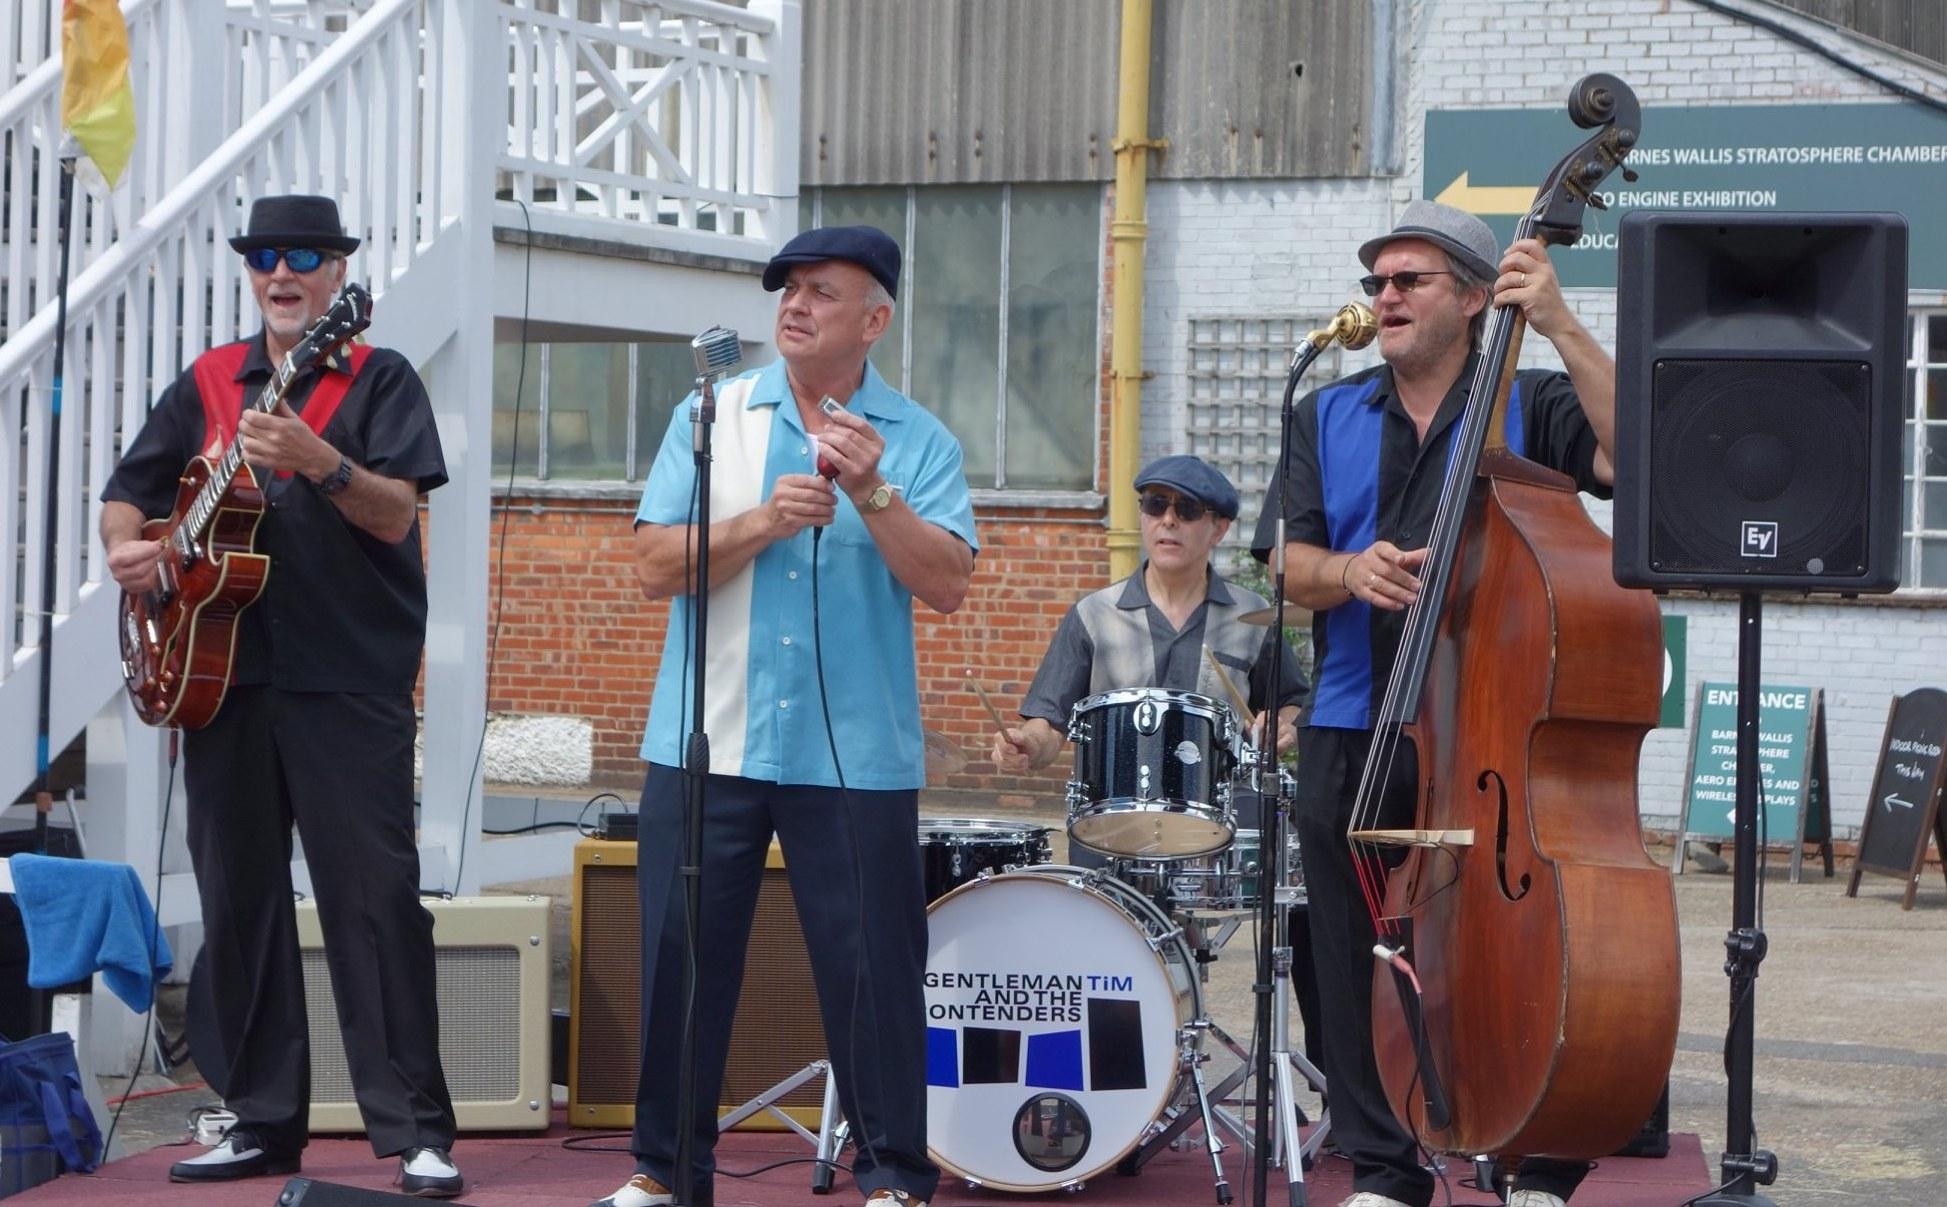 Gentleman Tim & the Contenders - 1950's West Coast & Chicago blues